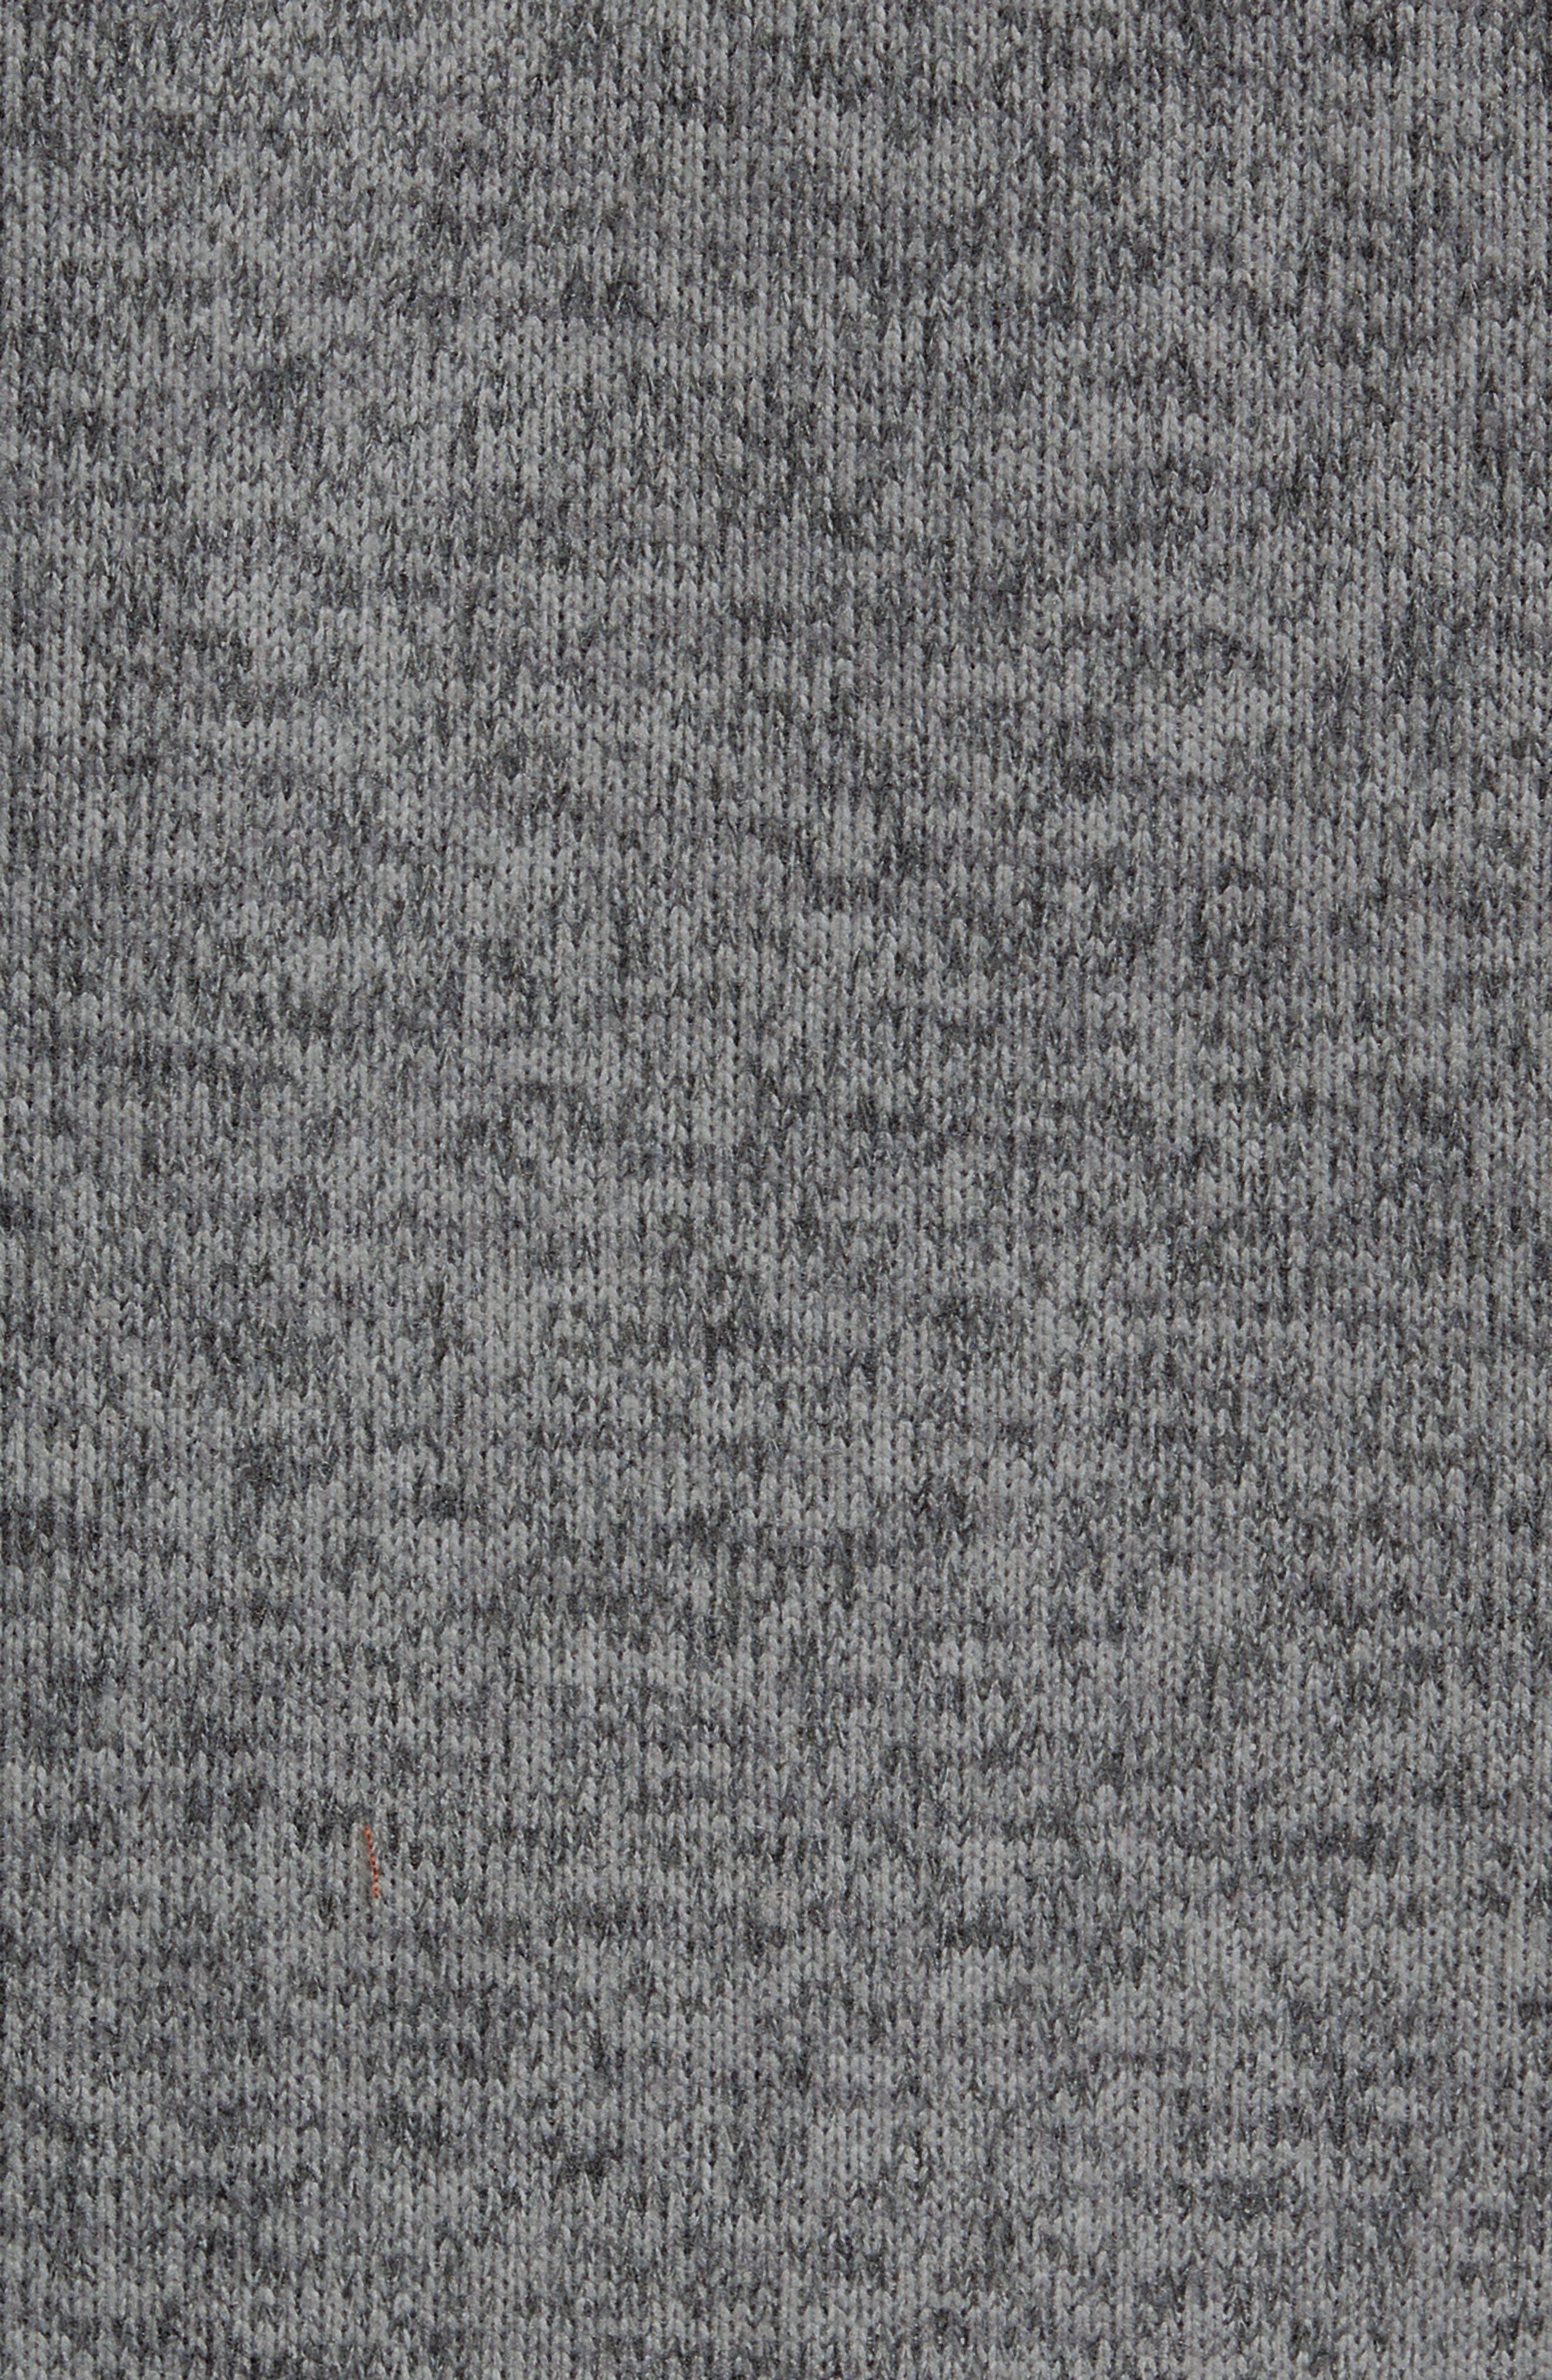 Gordon Lyons Alpine Sweater Fleece Hoodie,                             Alternate thumbnail 6, color,                             ASPHALT GREY/ MONUMENT GREY